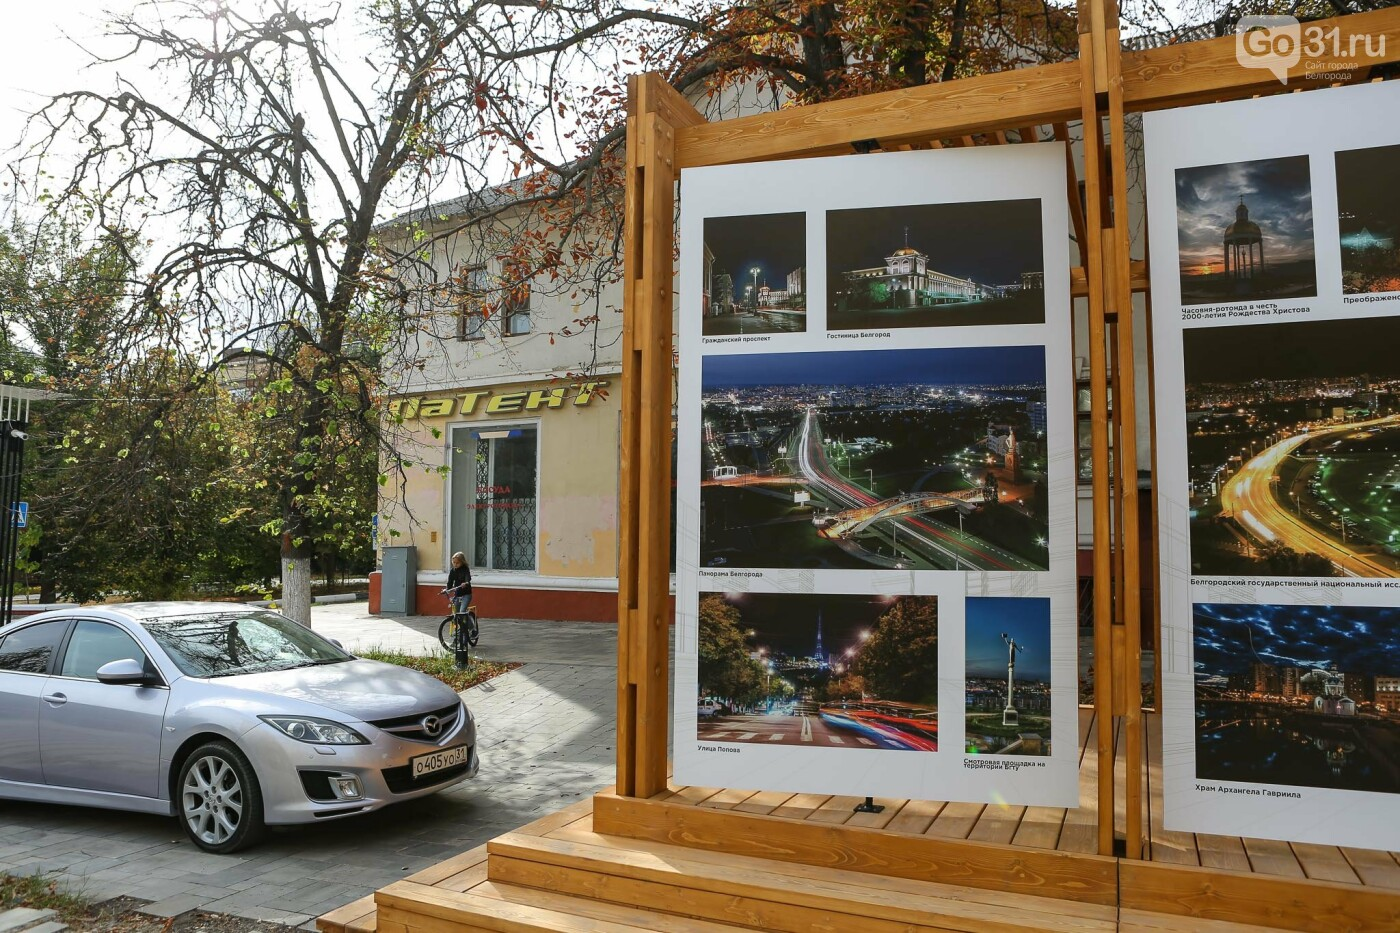 Счёт осени. Белгород желтеет к концу сентября, фото-14